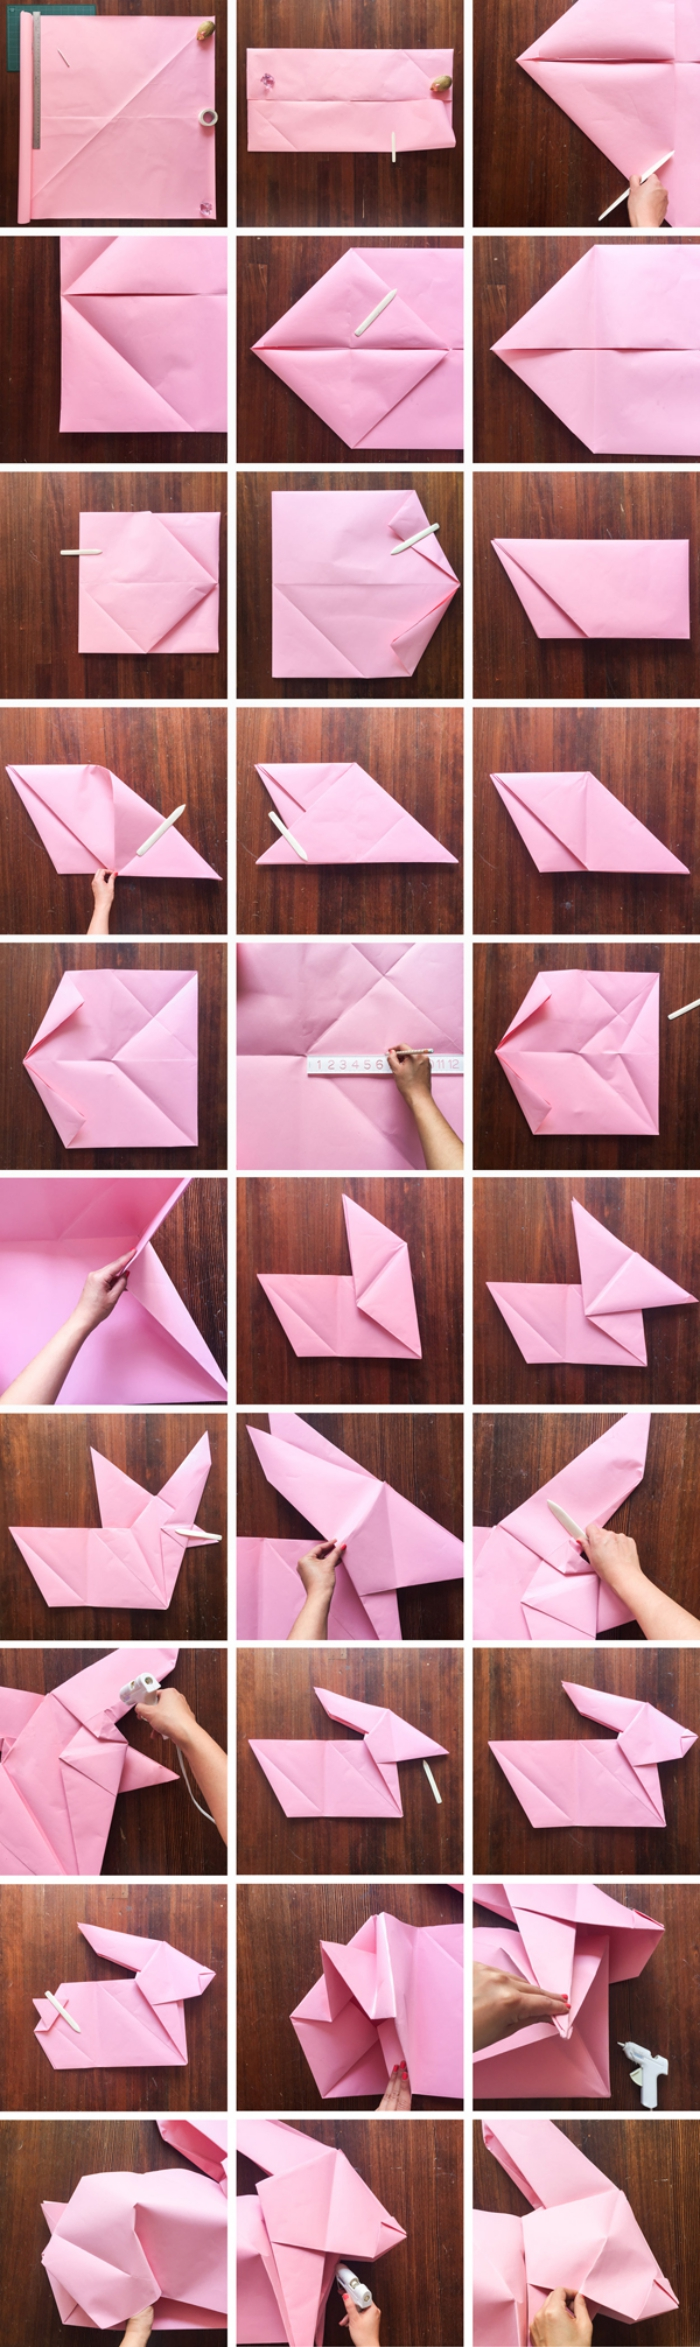 origami osterhase aus rosa papier falten, hase basteln aus papier, anleitung